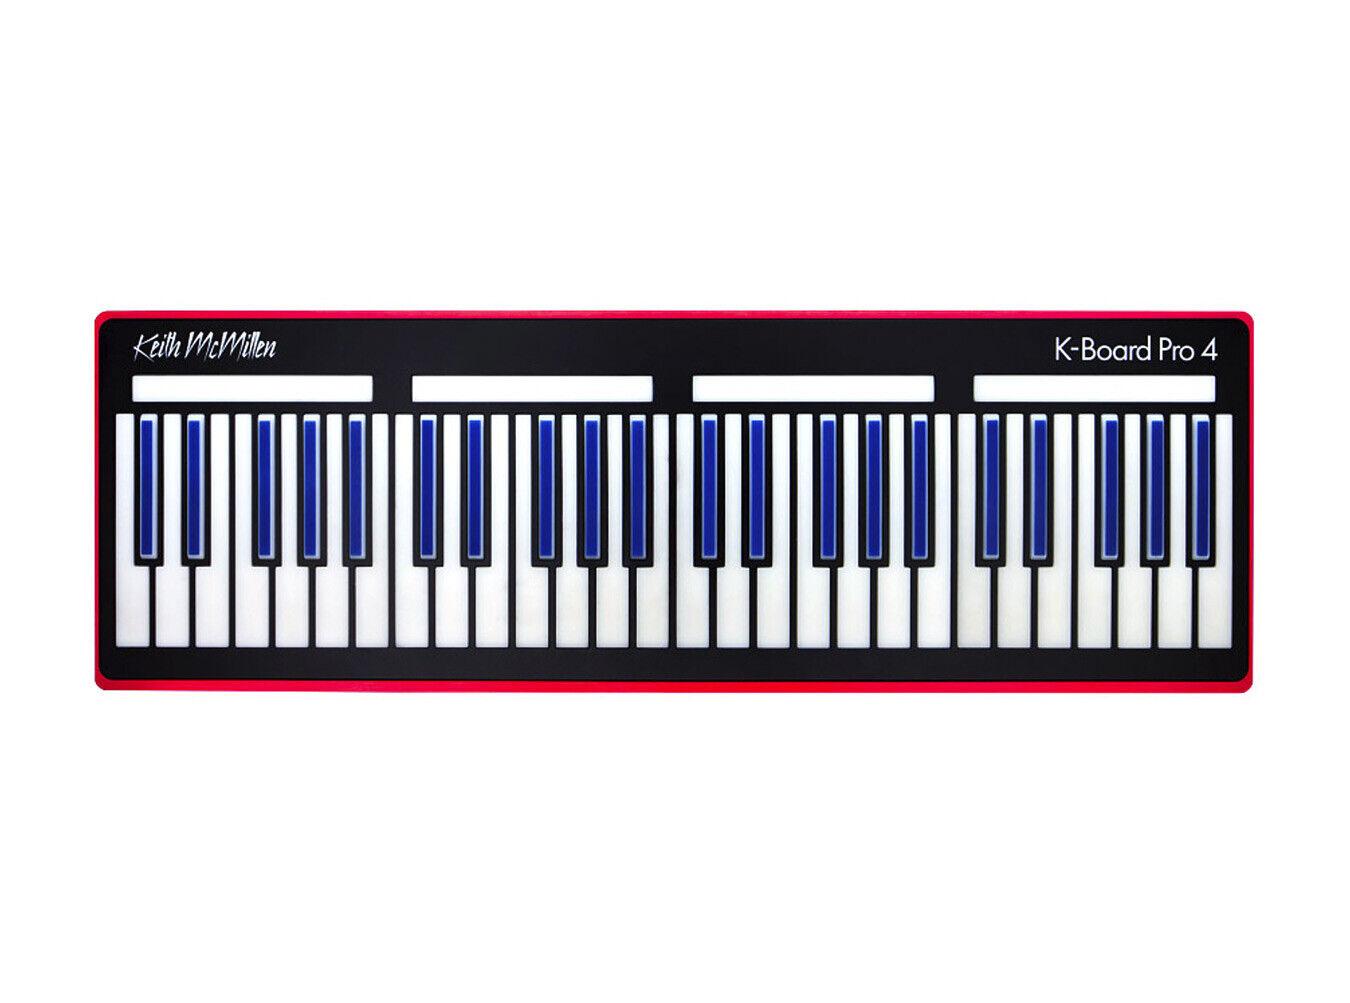 Keith McMillen K-Board Pro 4 Keyboard MIDI CONTROLLER - NEW - PERFECT CIRCUIT